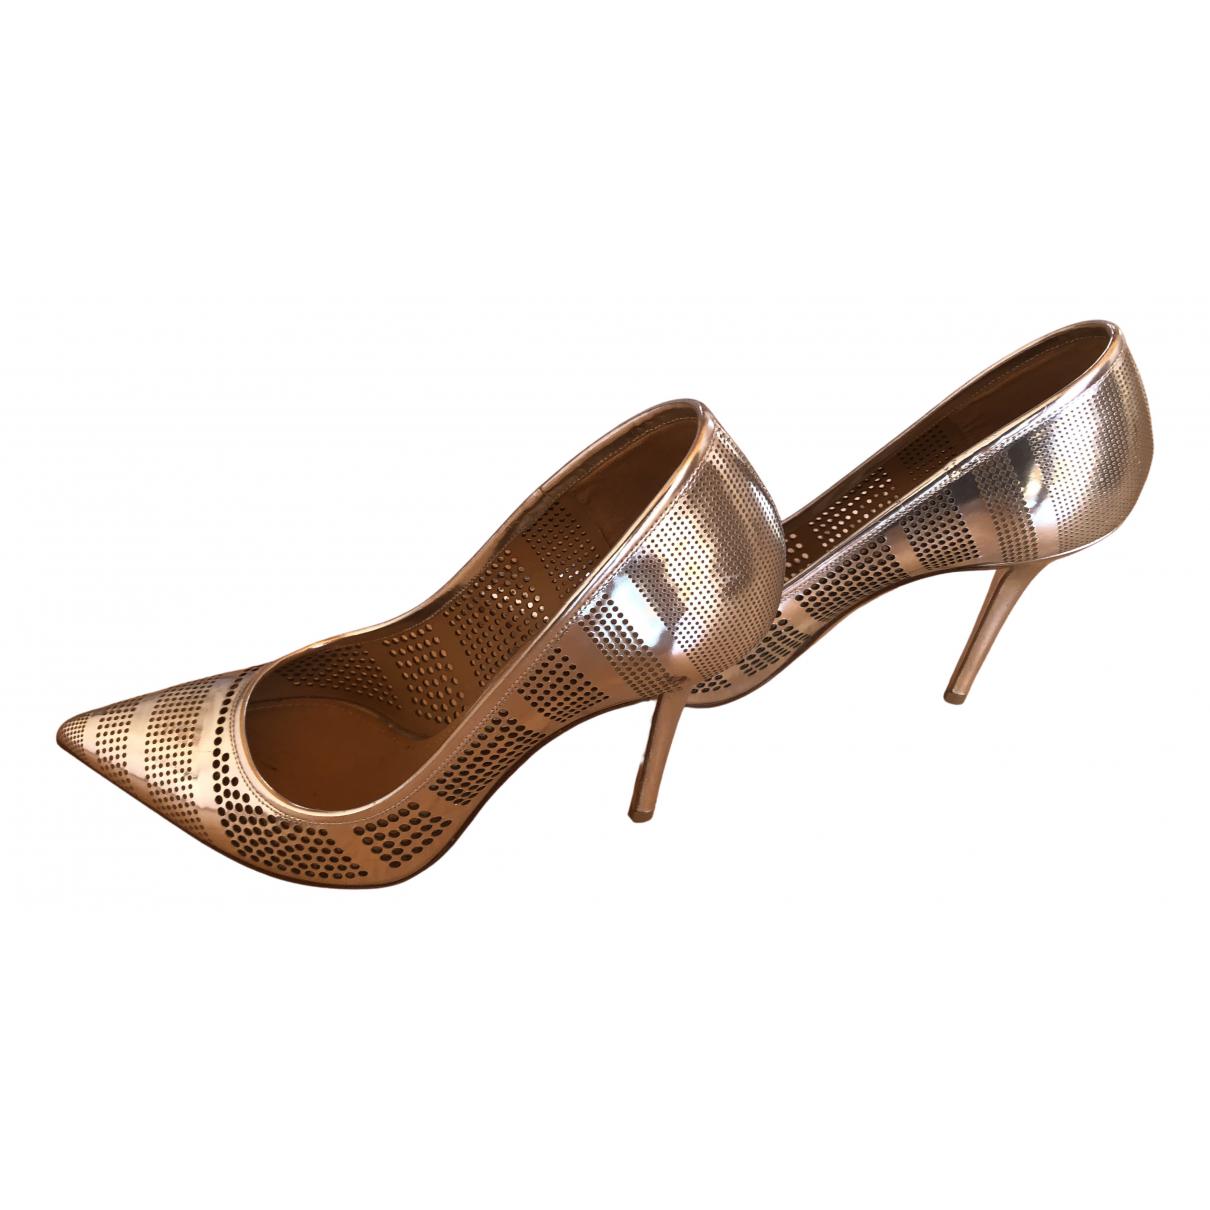 Salvatore Ferragamo N Silver Leather Heels for Women 8.5 US